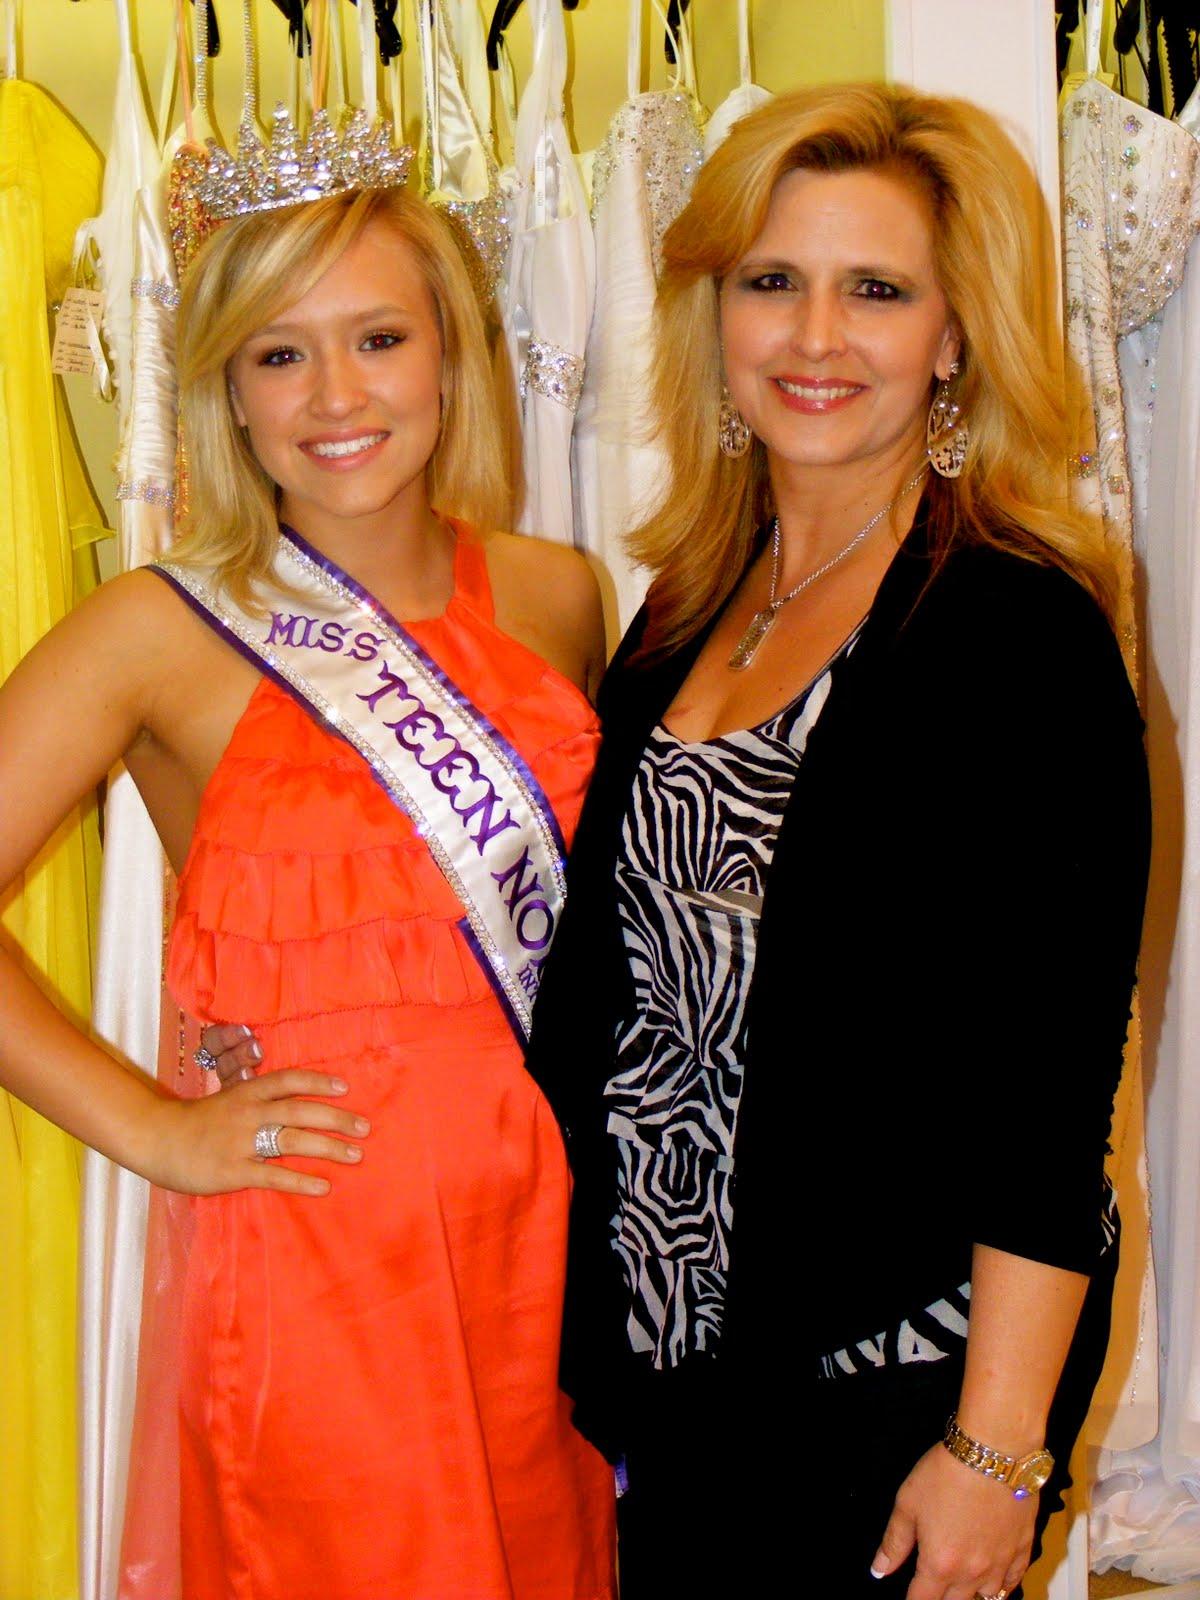 Miss Teen North Carolina International goes to Gregory Ellenburg's